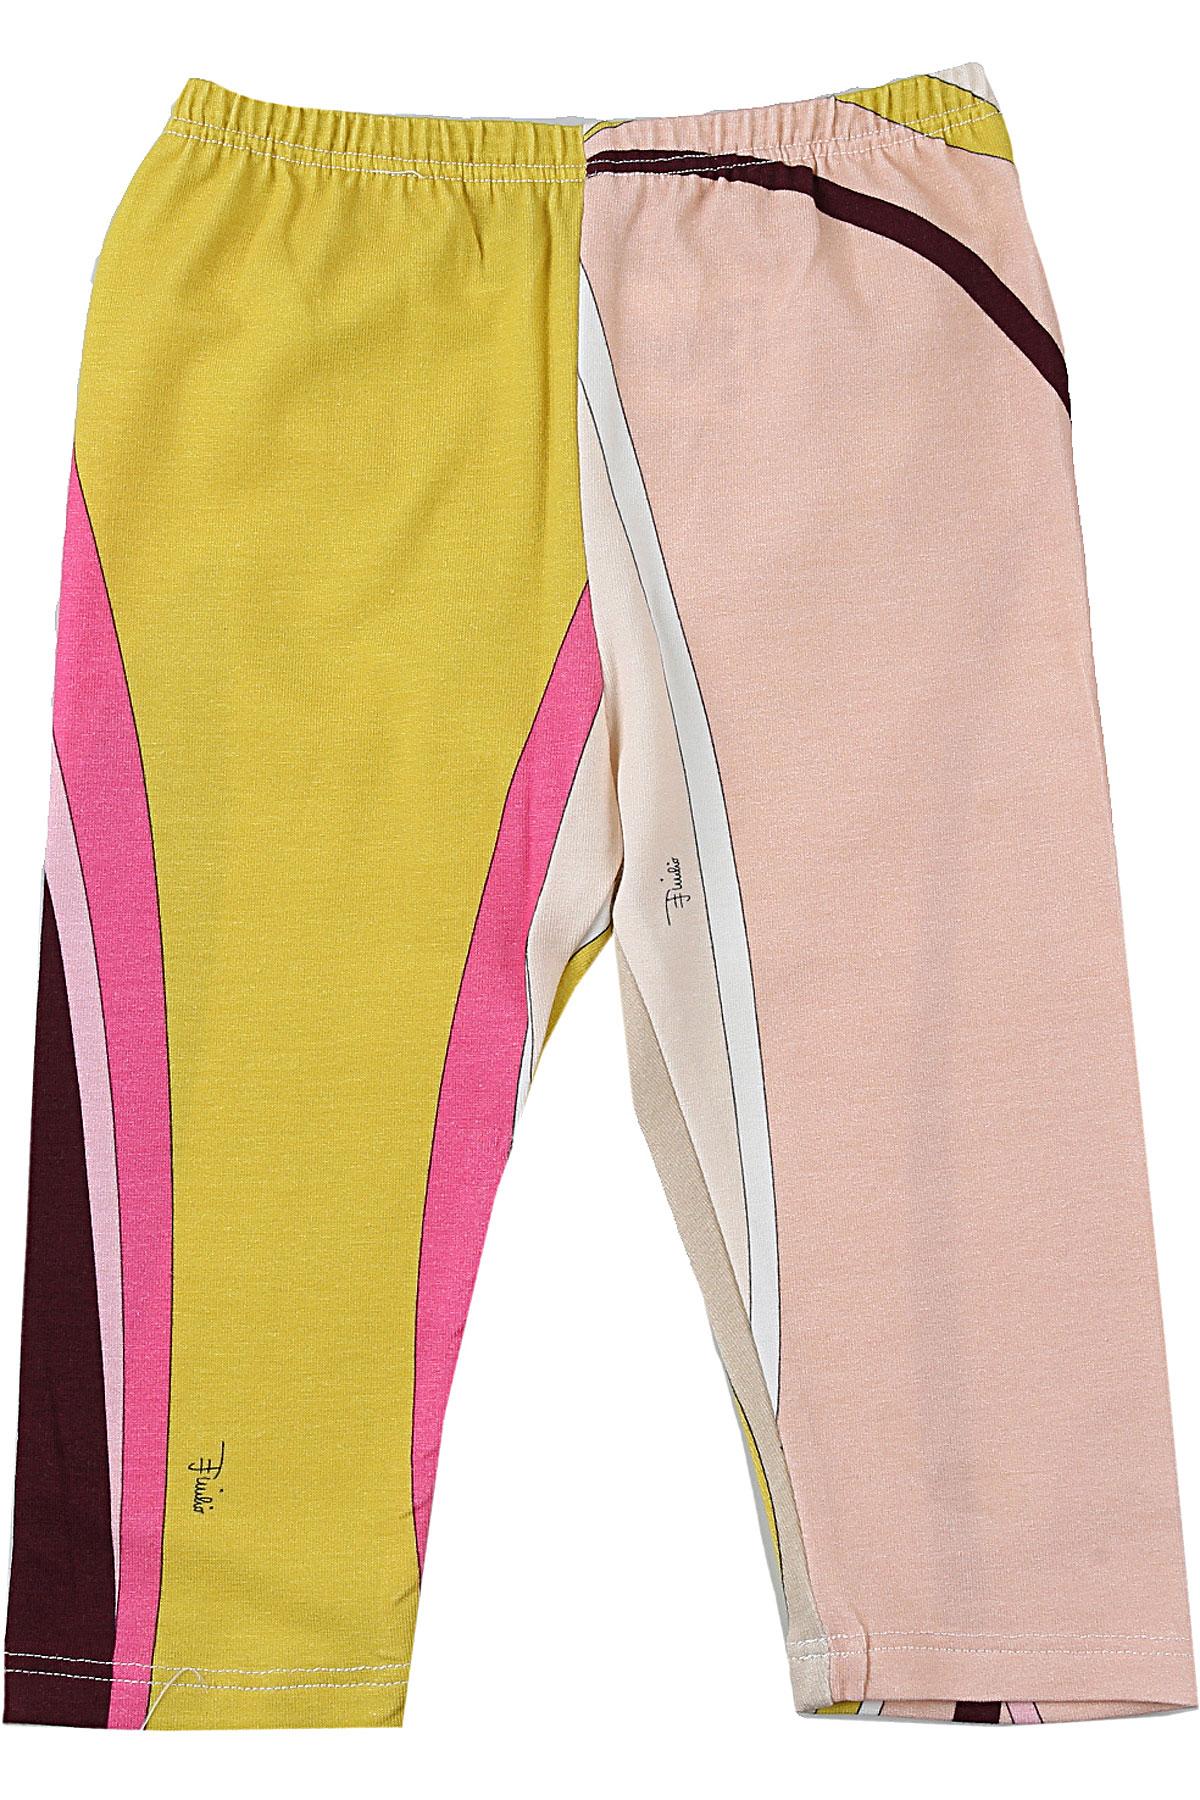 Emilio Pucci Baby Pants for Girls On Sale, Multicolor, Cotton, 2019, 12M 18M 2Y 3M